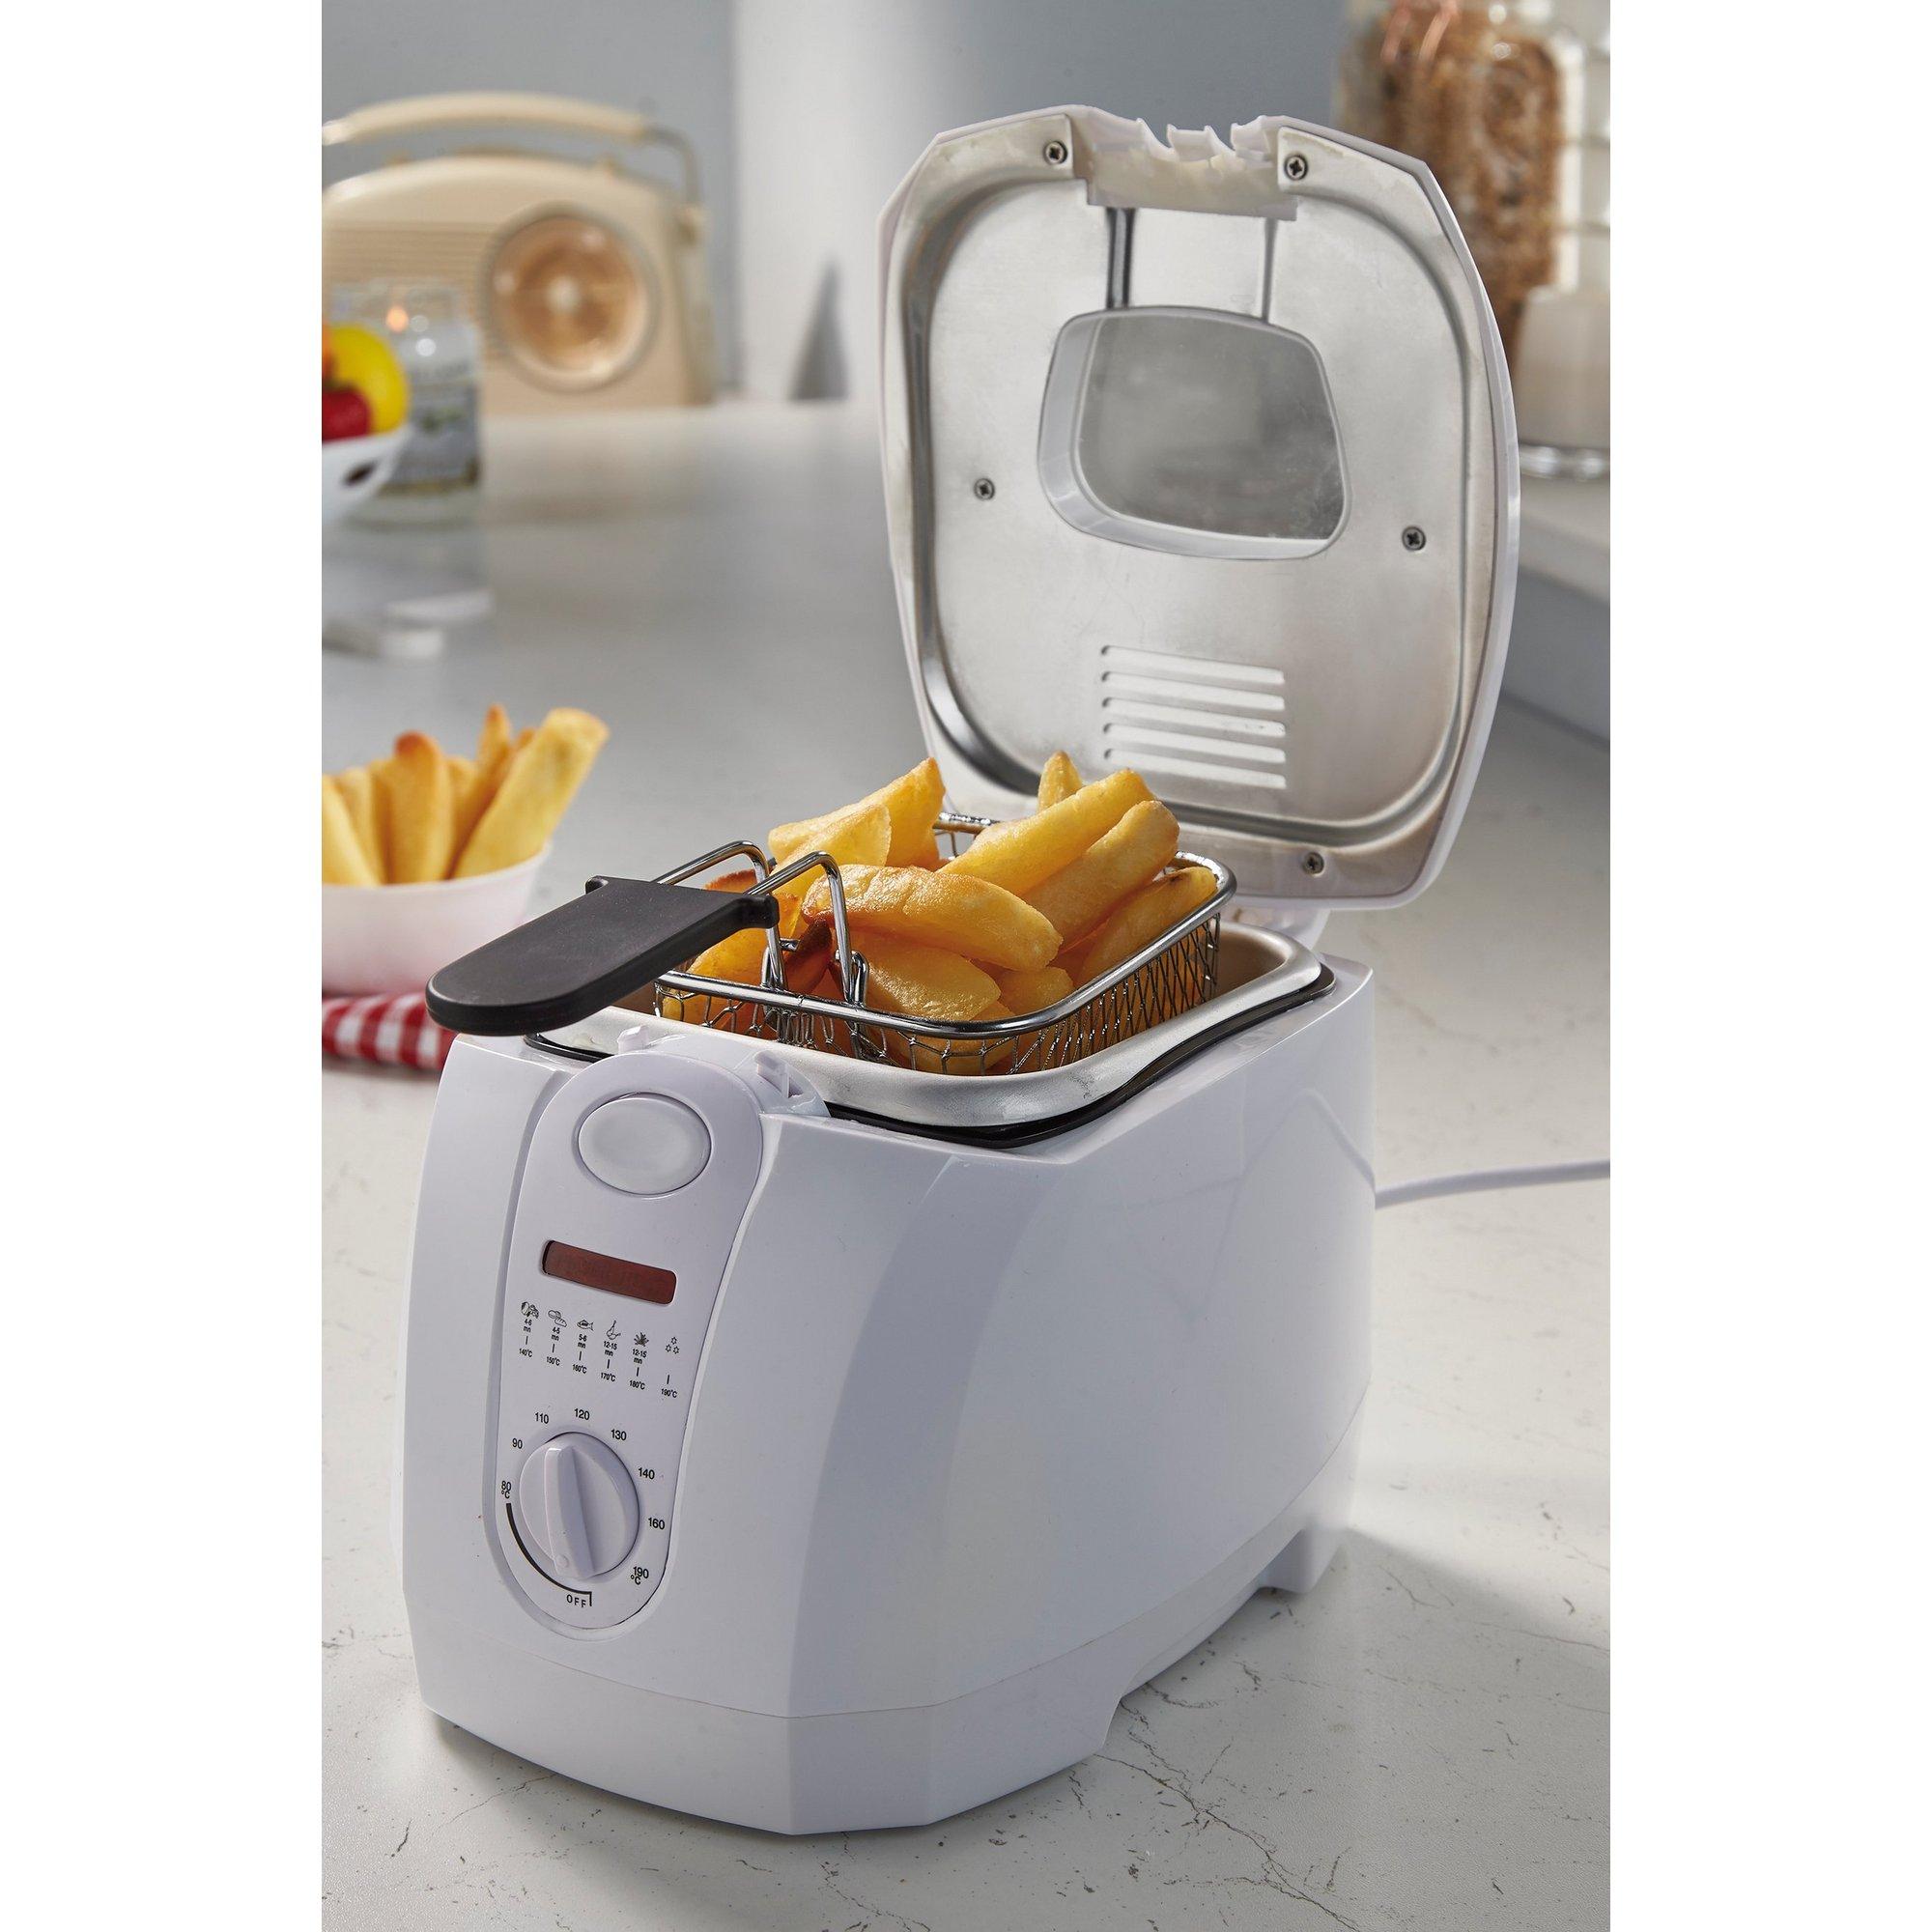 Image of Compact Deep Fat Fryer